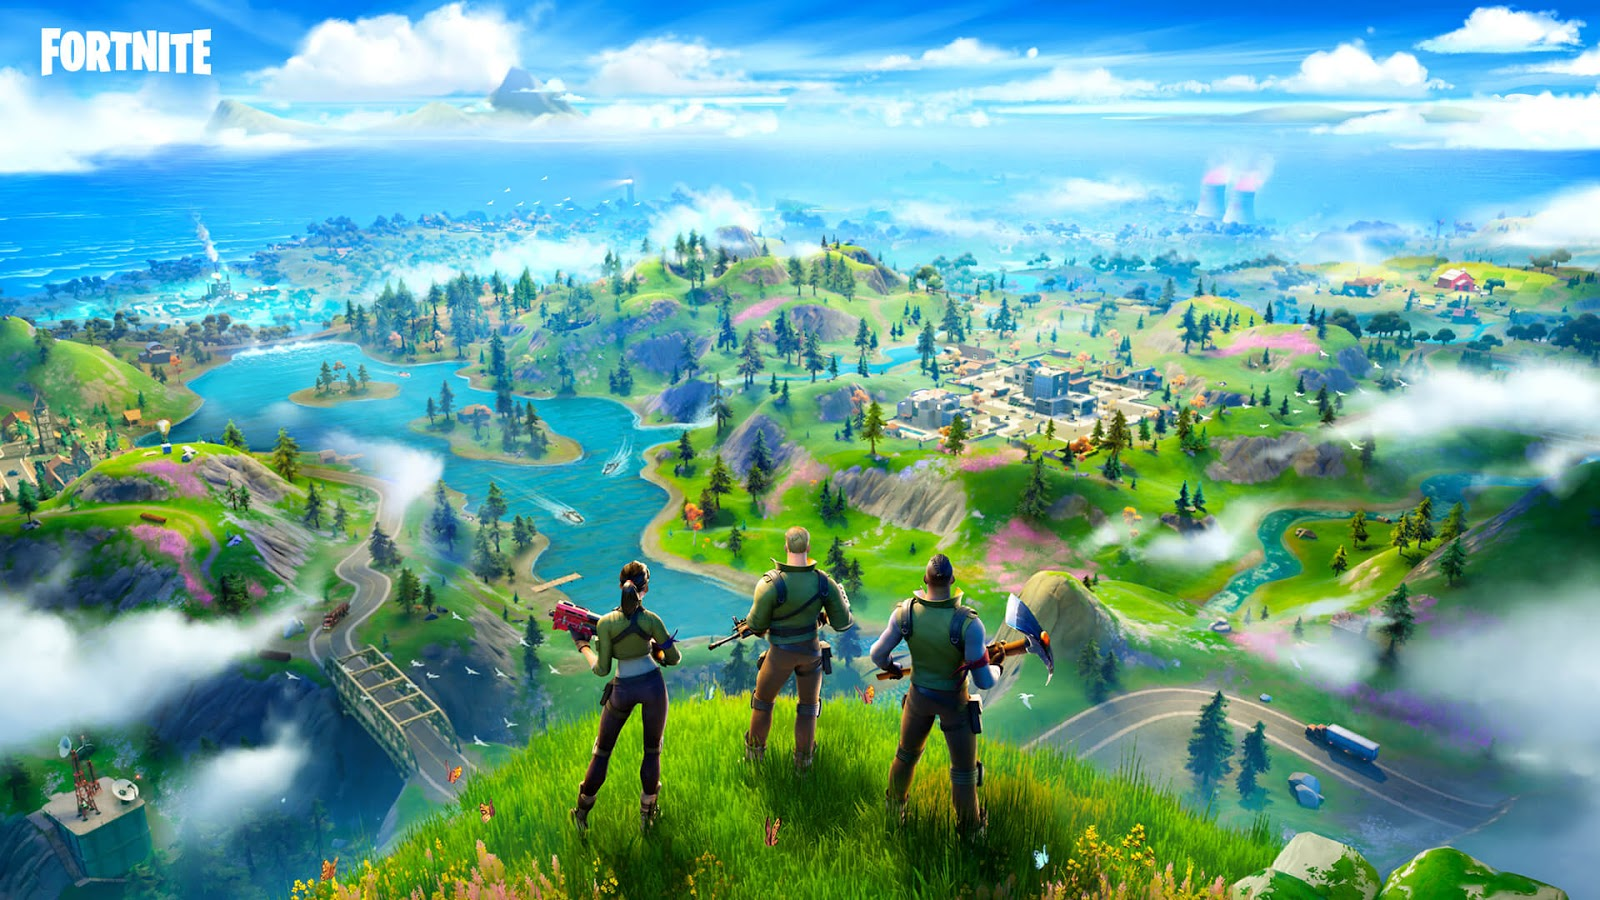 Image promotionnelle, Fortnite, Epic Games, 2017